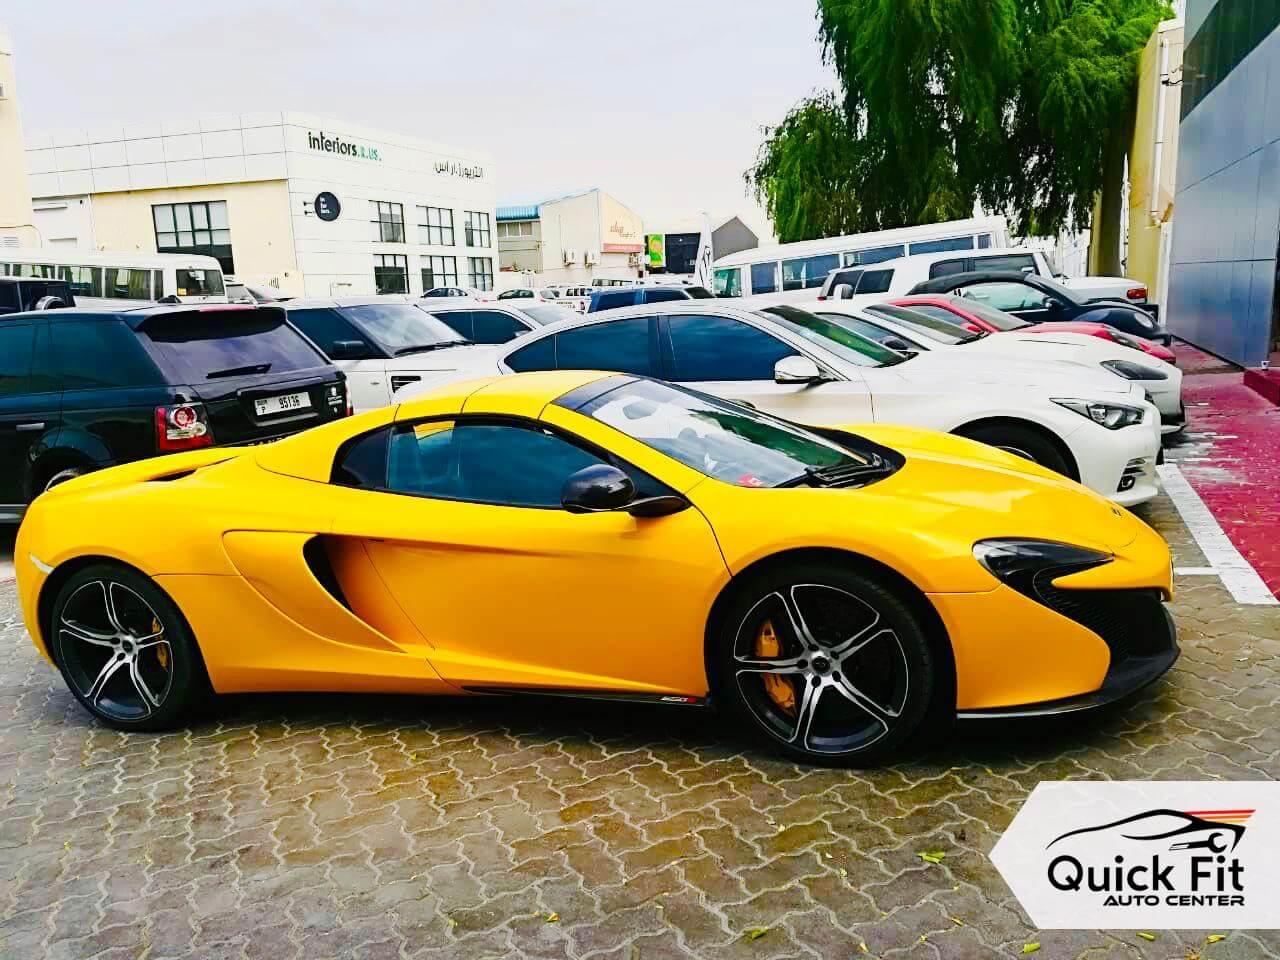 Lamborghini for AC And Brakes Service at Quick Fit Auto Center